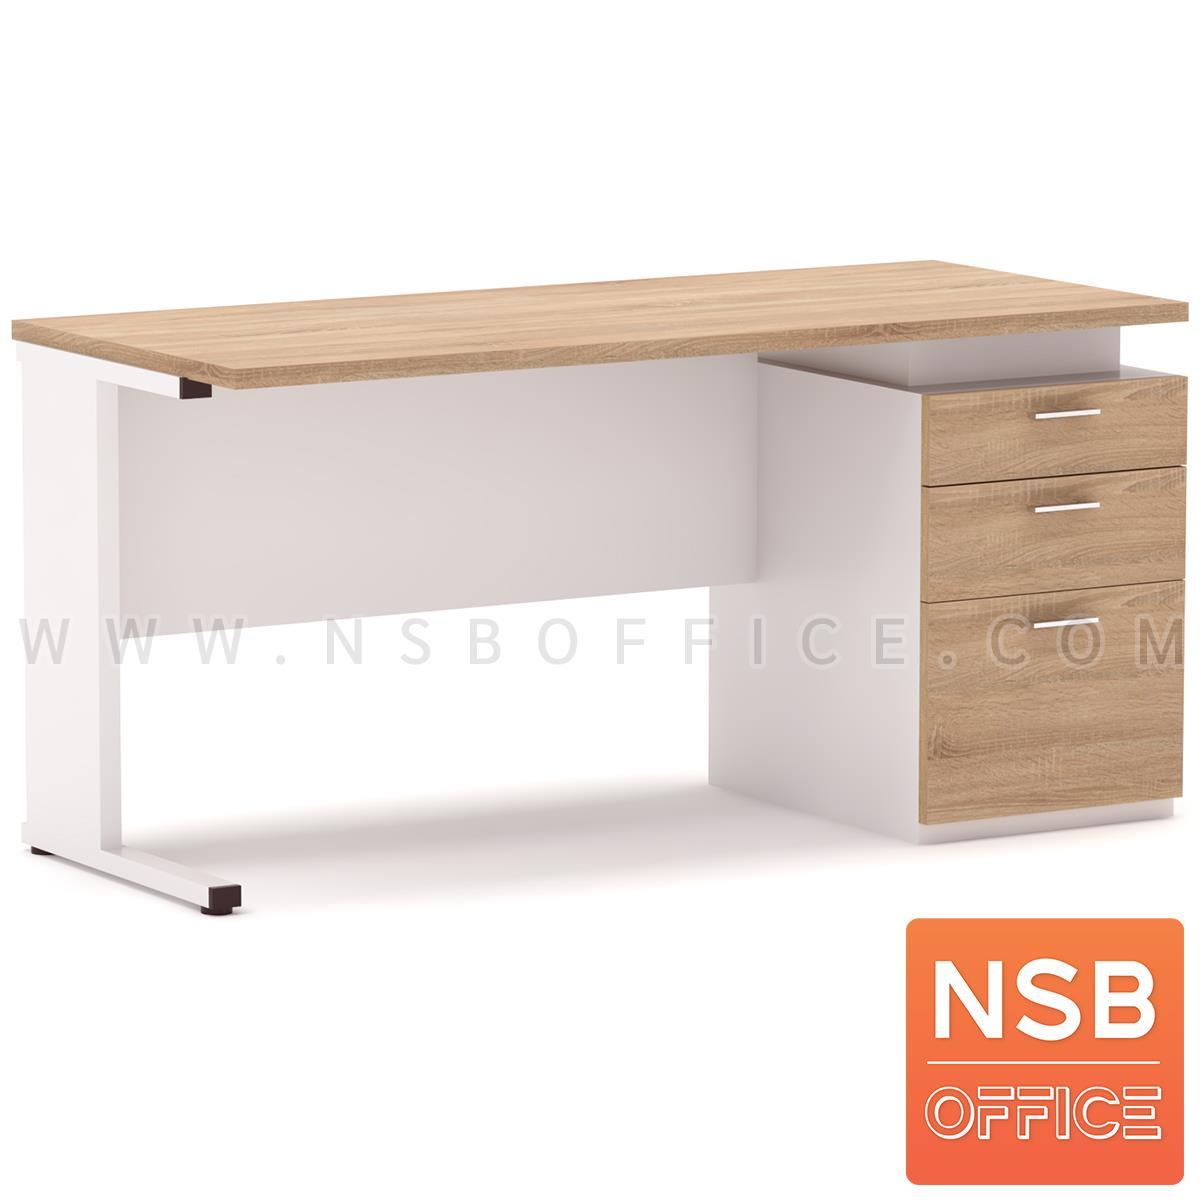 A10A097:โต๊ะทำงาน 3 ลิ้นชัก รุ่น Bari (บารี) ขนาด 120W, 150W cm. ขาเหล็ก